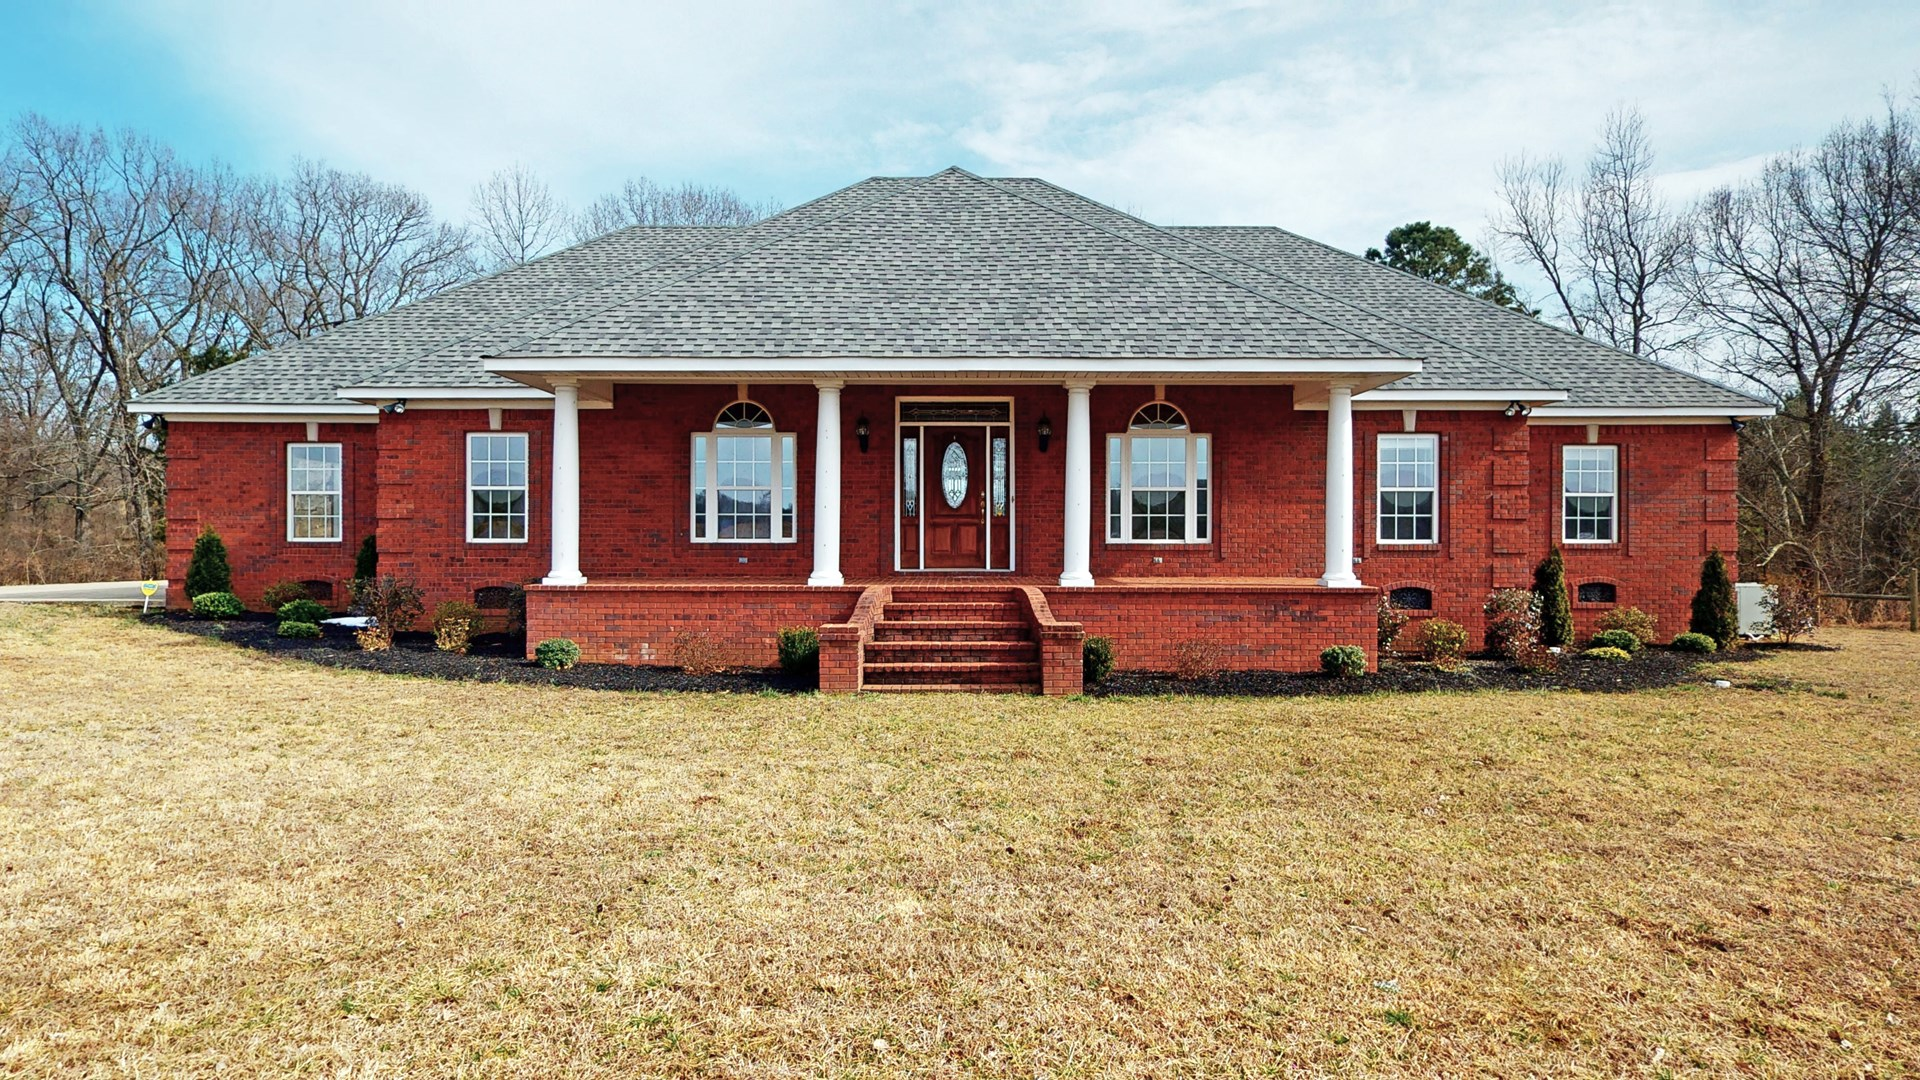 Custom Built Home for Sale in Henderson County TN, Basement